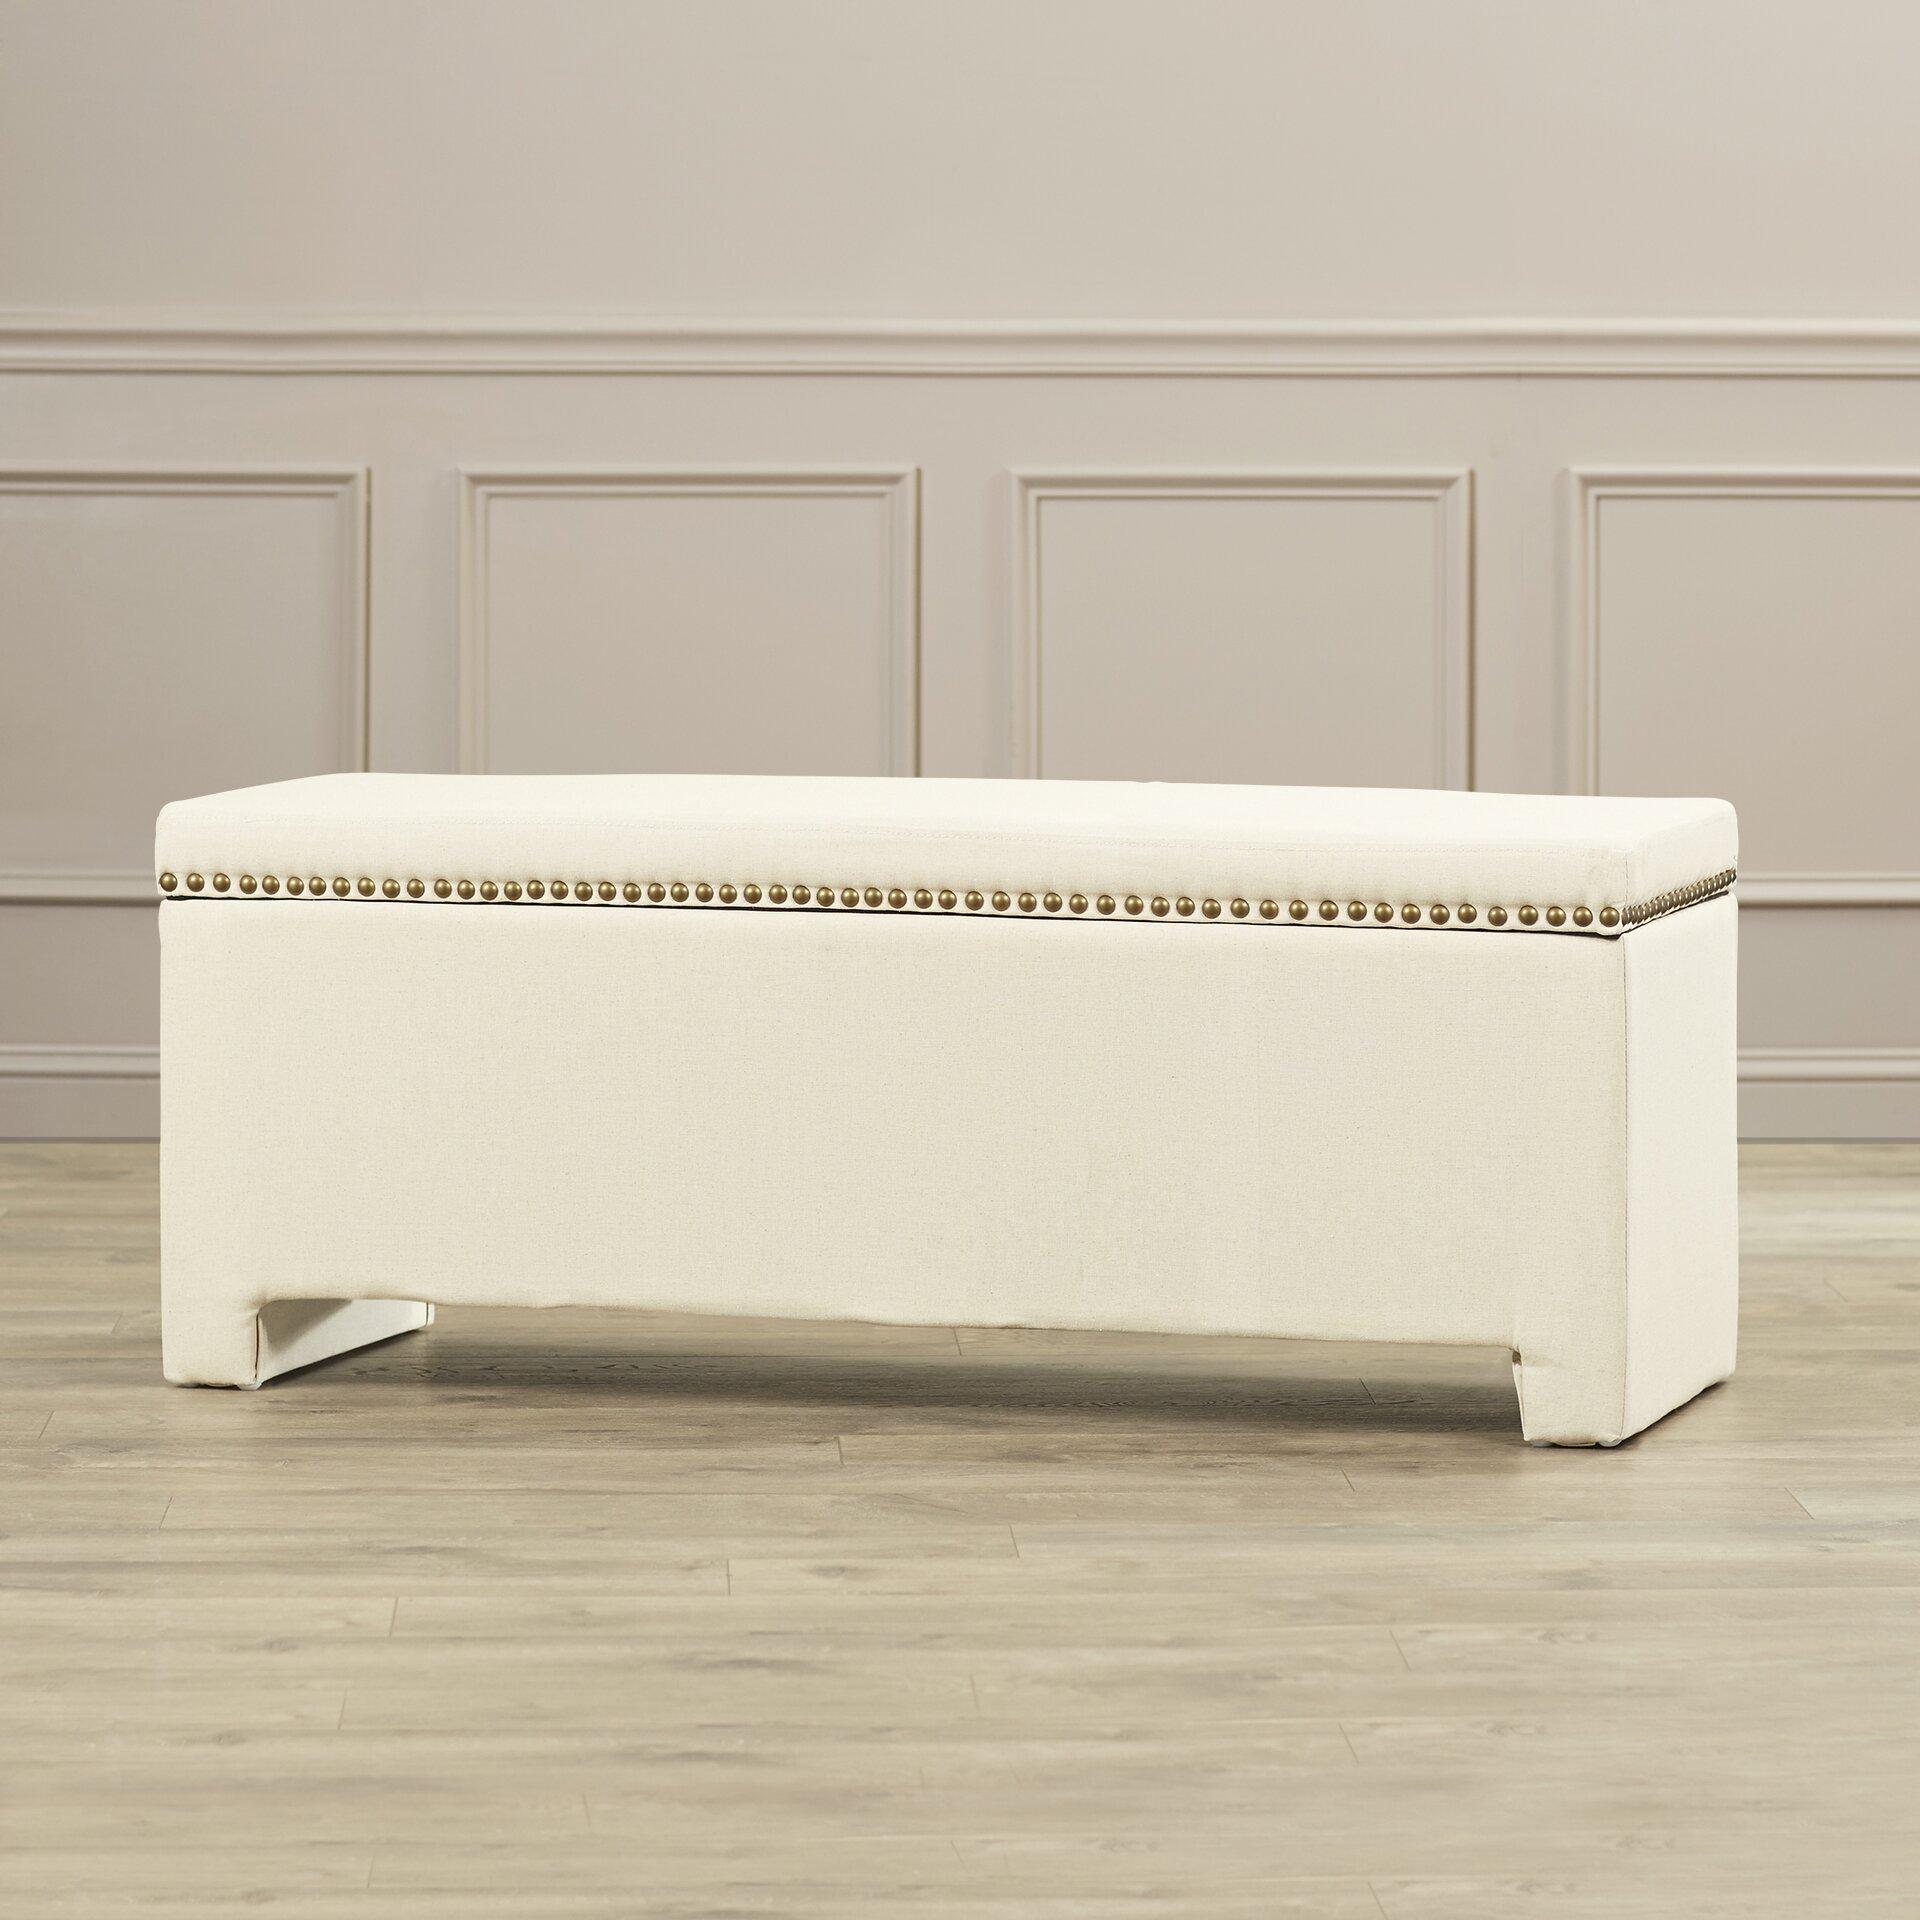 Chandra Upholstered Storage Bedroom Bench Reviews: Alcott Hill Cloville Upholstered Storage Bedroom Bench